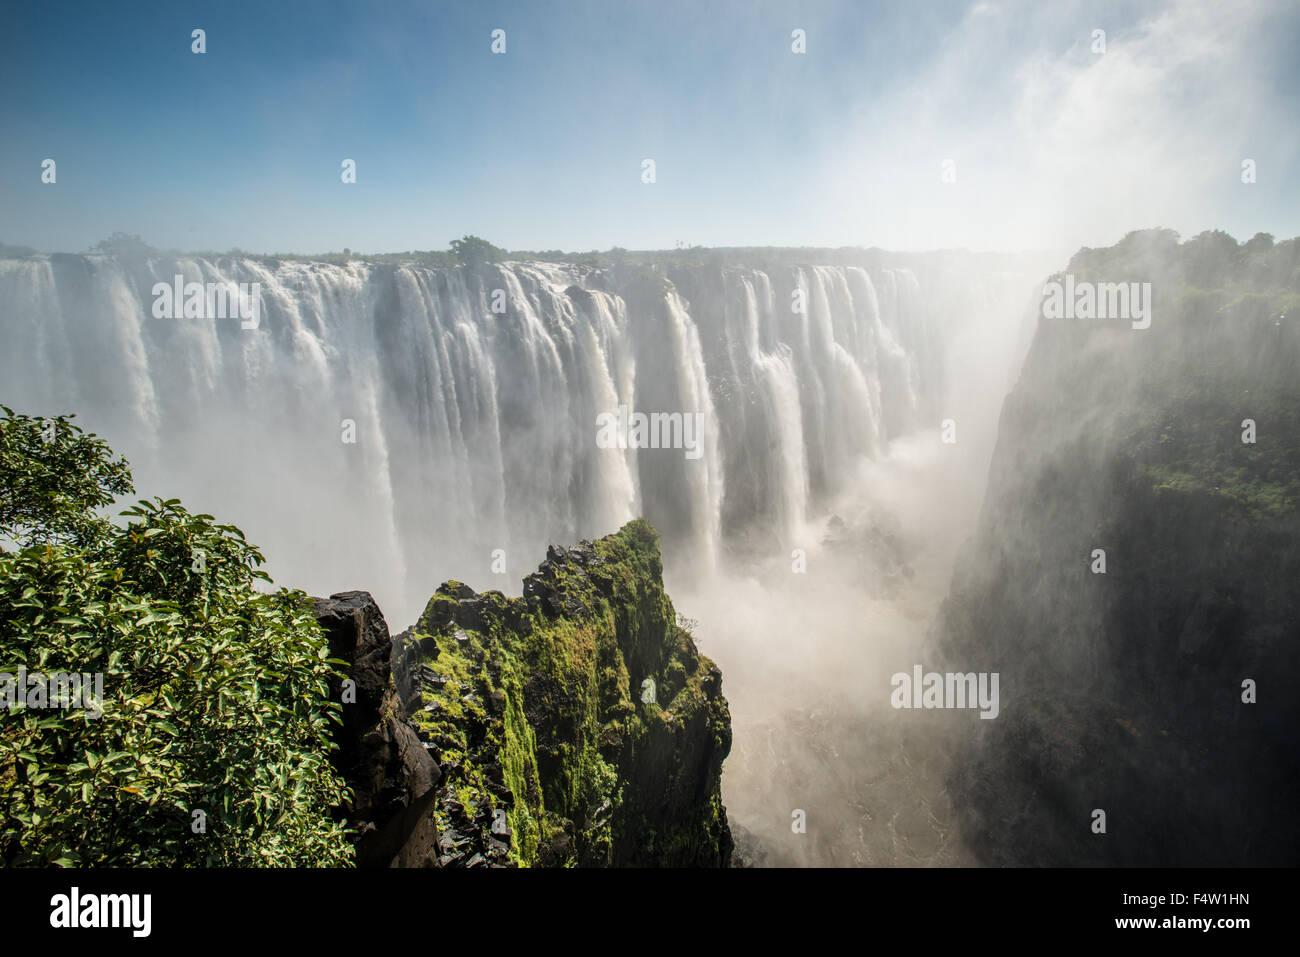 Victoria Falls, Zimbabwe - Victoria Falls Cascade Photo Stock